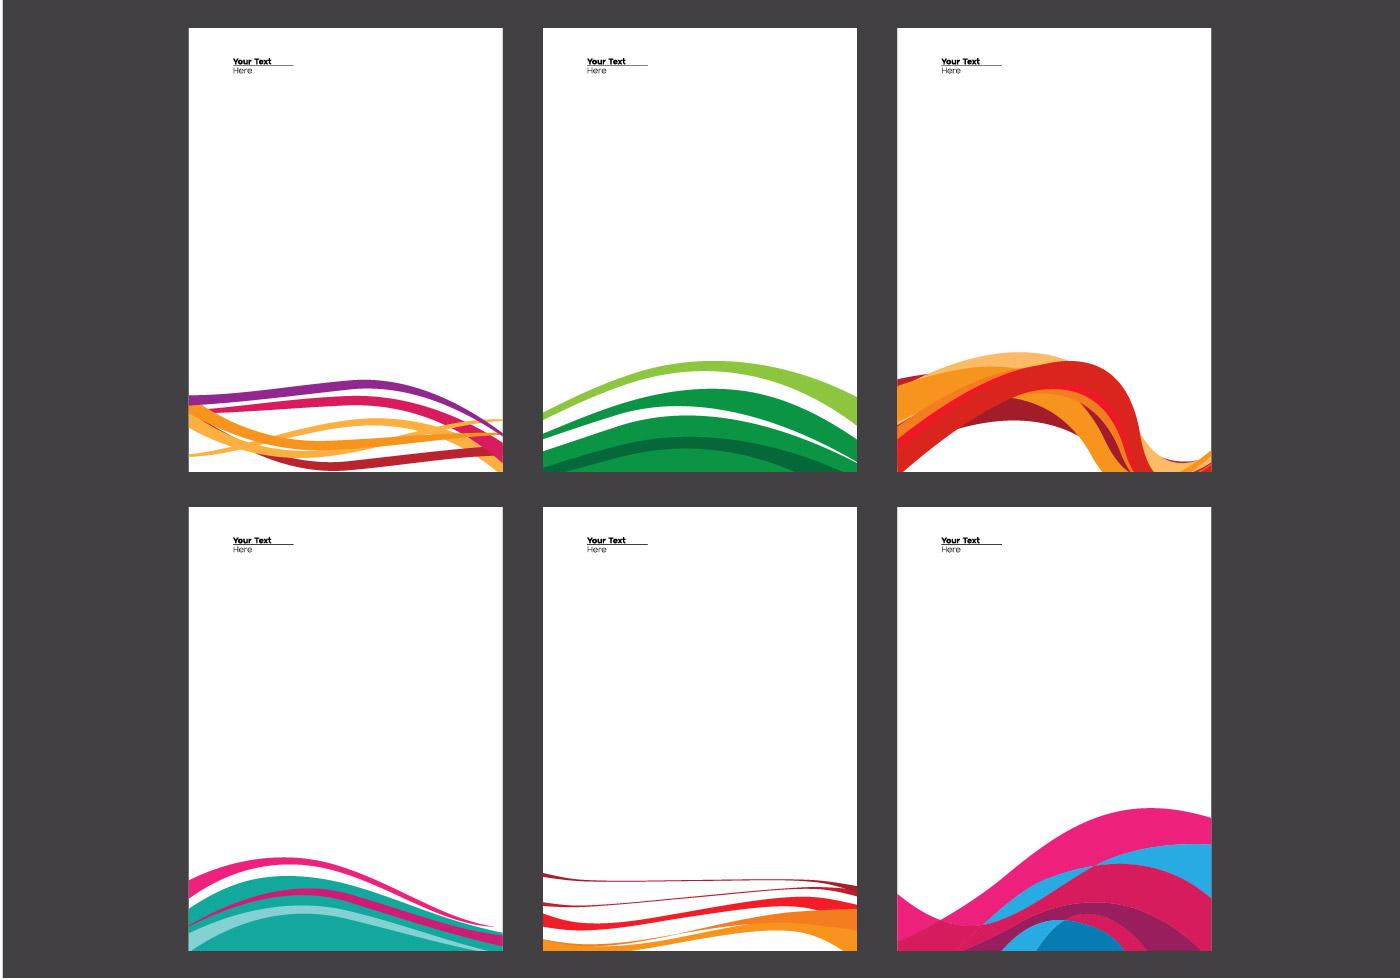 Line Art Design Free Download : Letterhead with line design vector download free